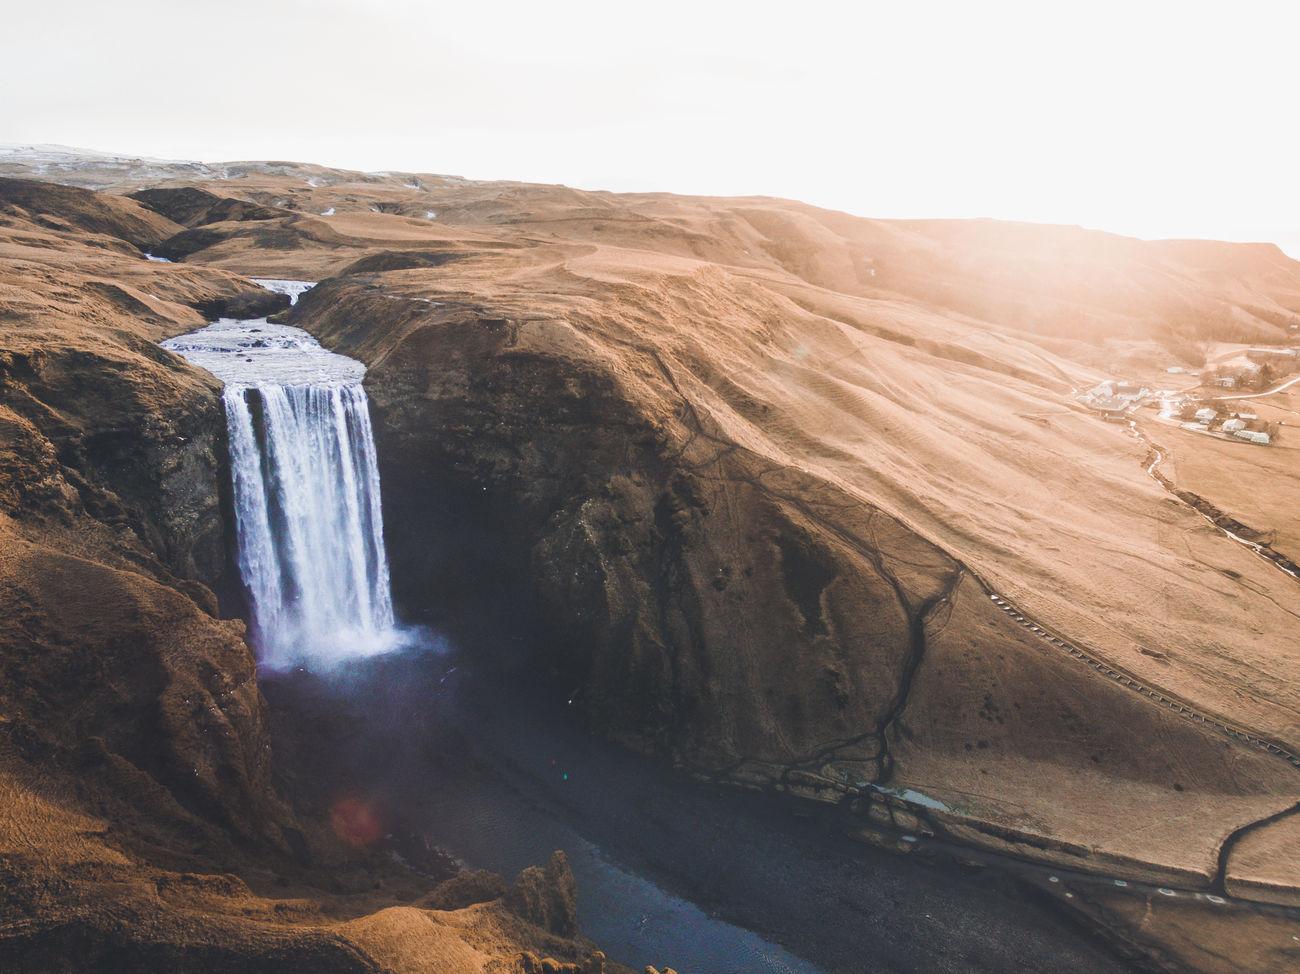 Beautiful stock photos of wasserfall, Iceland, Reykjavik, Sun Flare, beauty In Nature